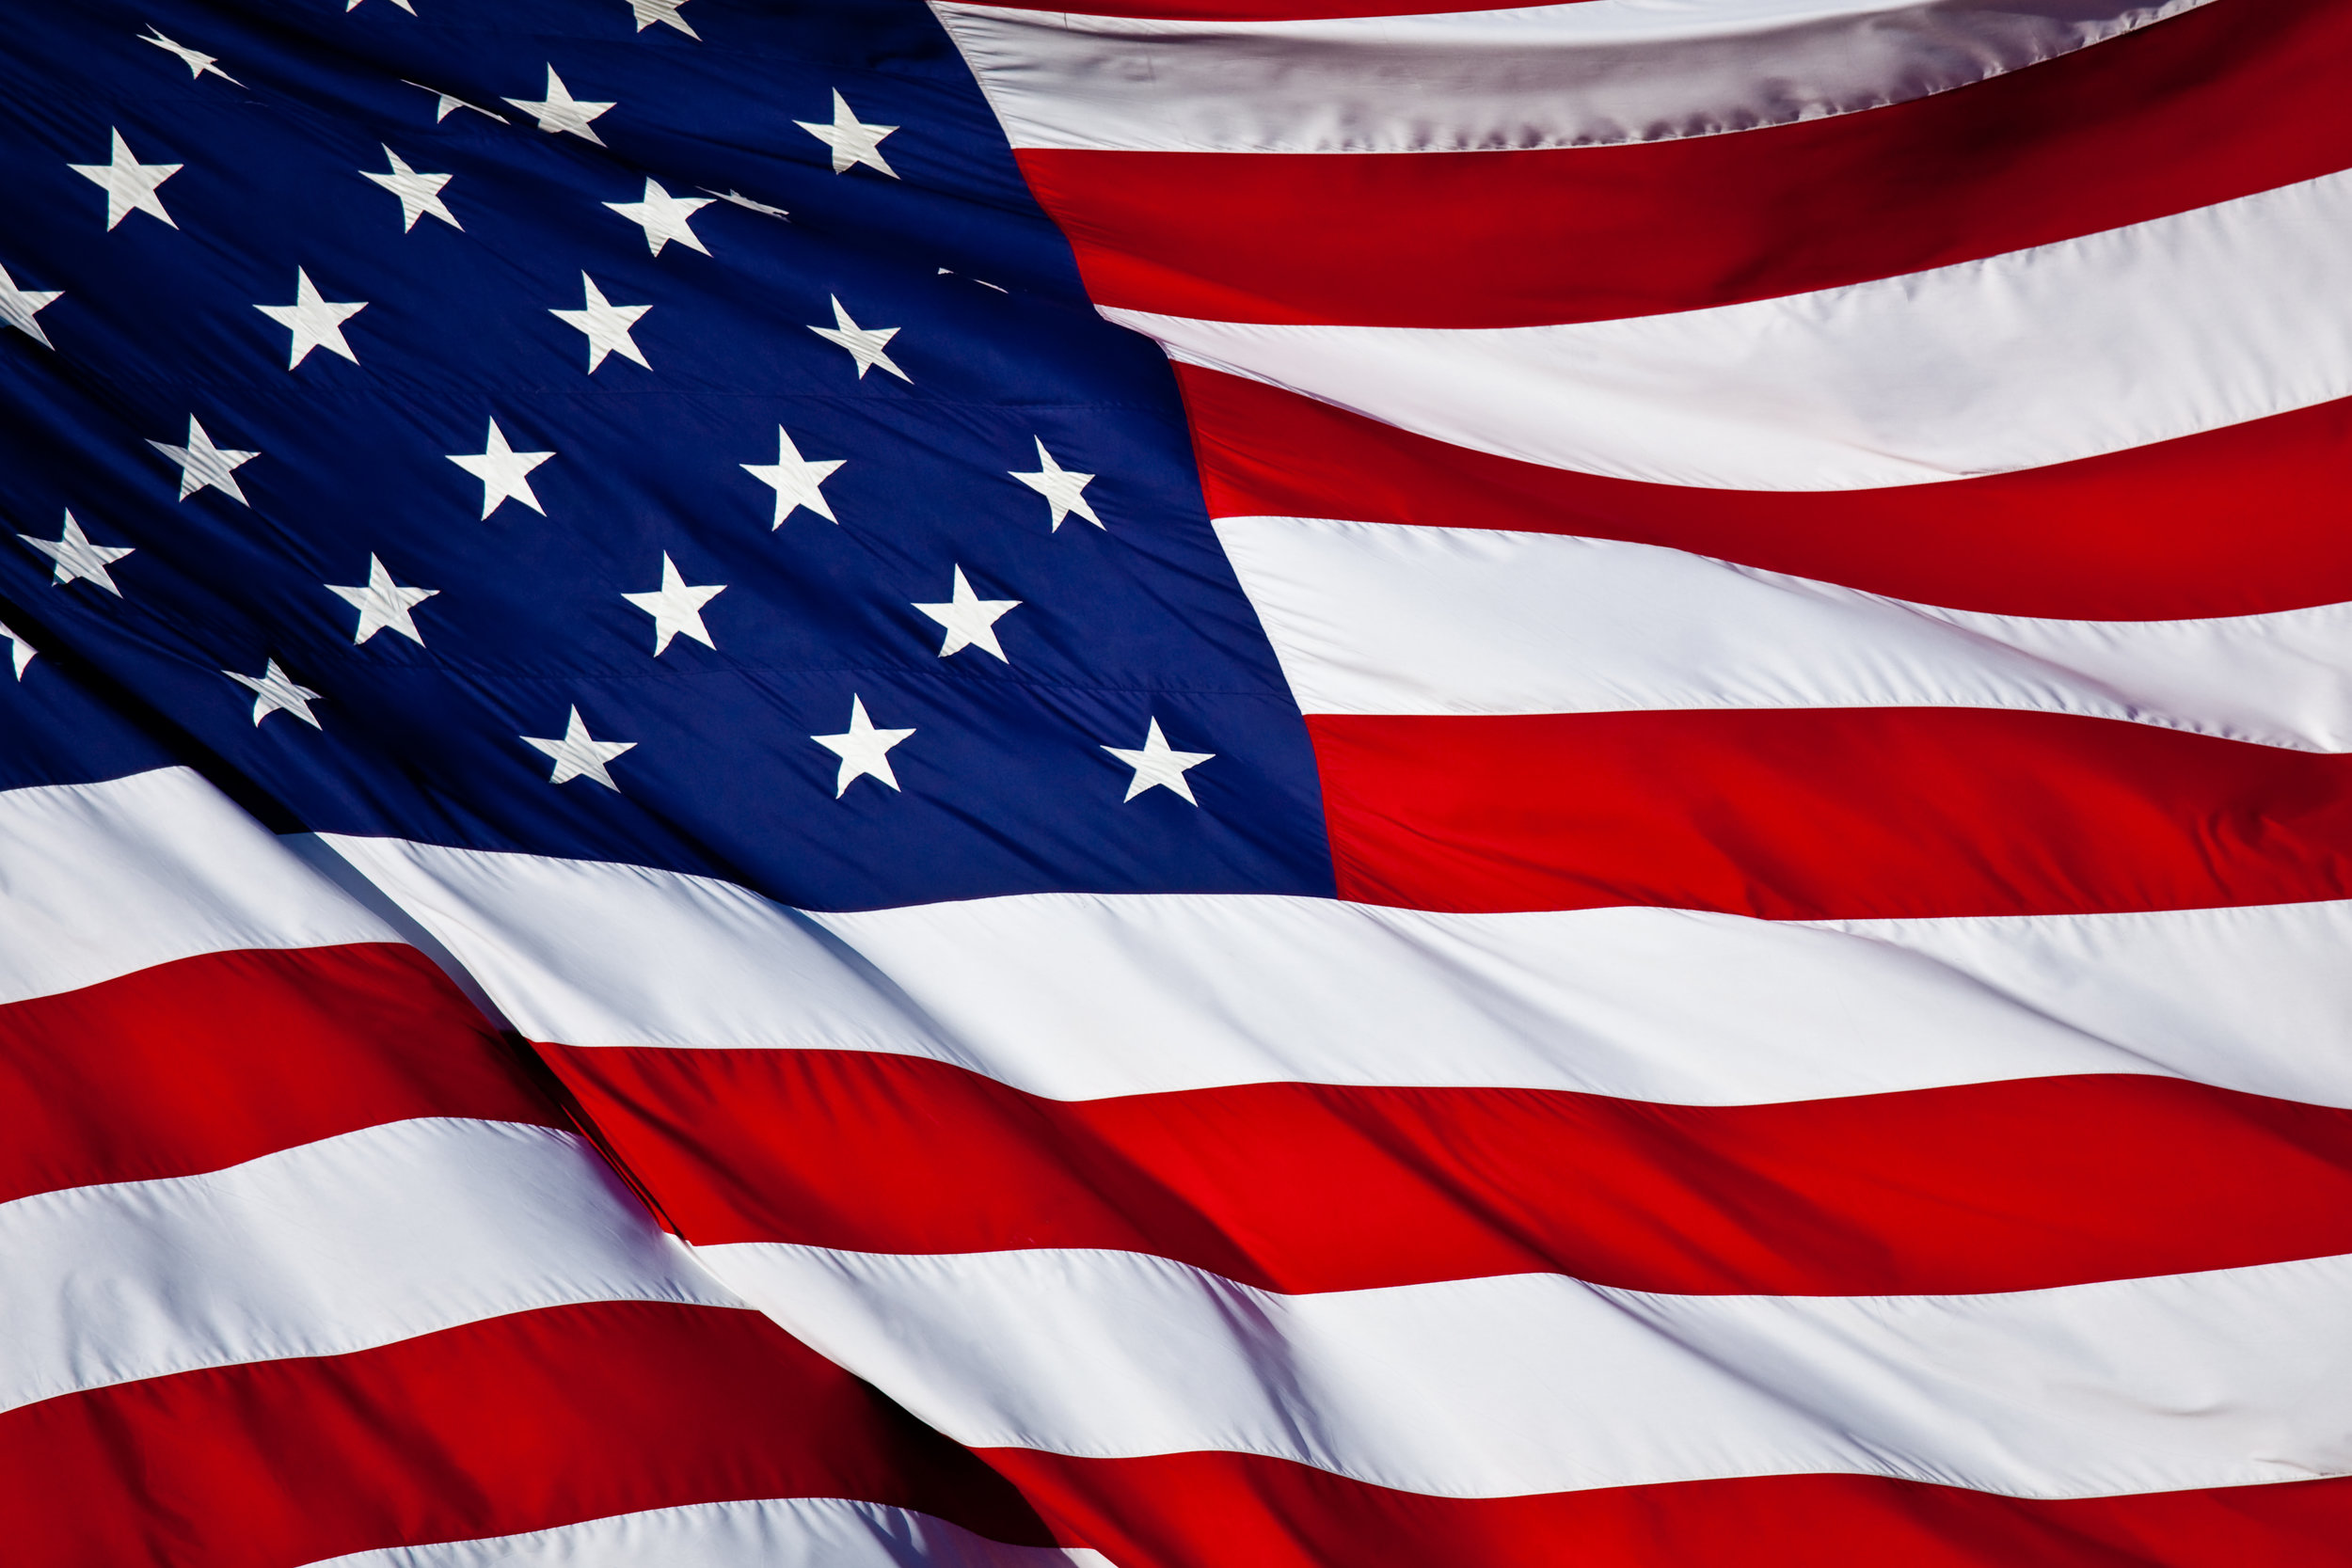 United States Images